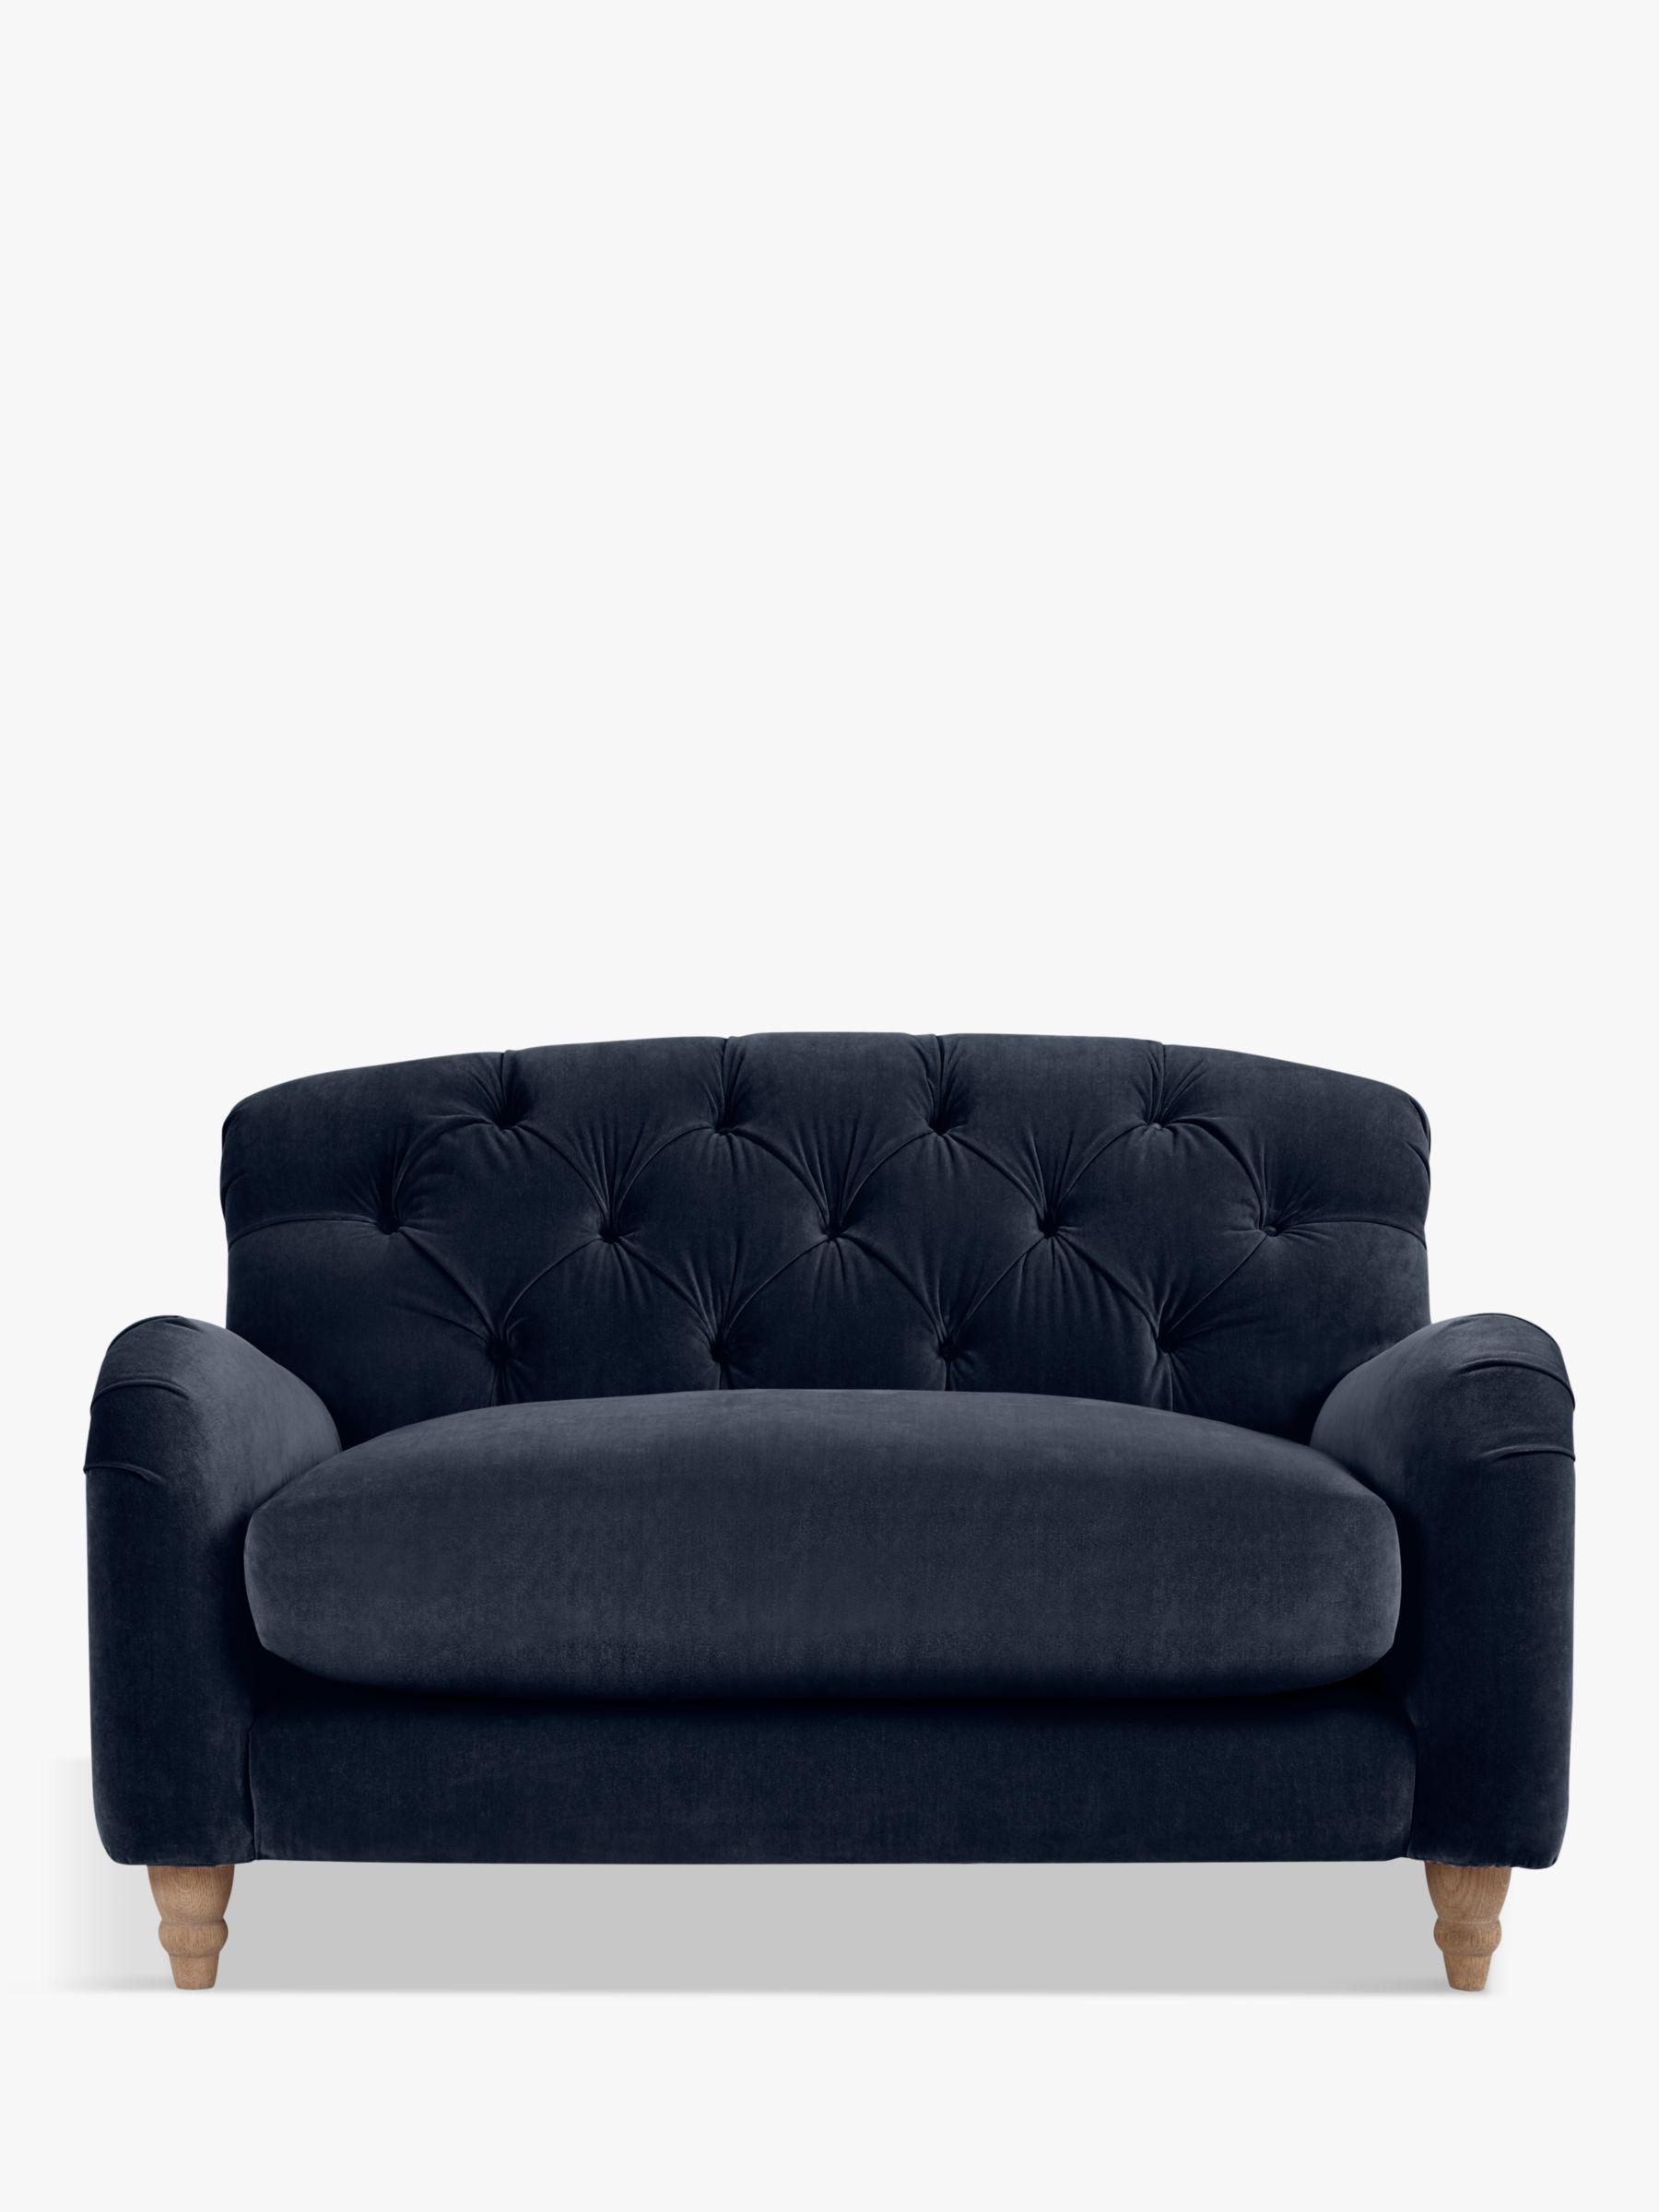 camden sofa john lewis vacuum cleaner for fabric snugglers | sofas